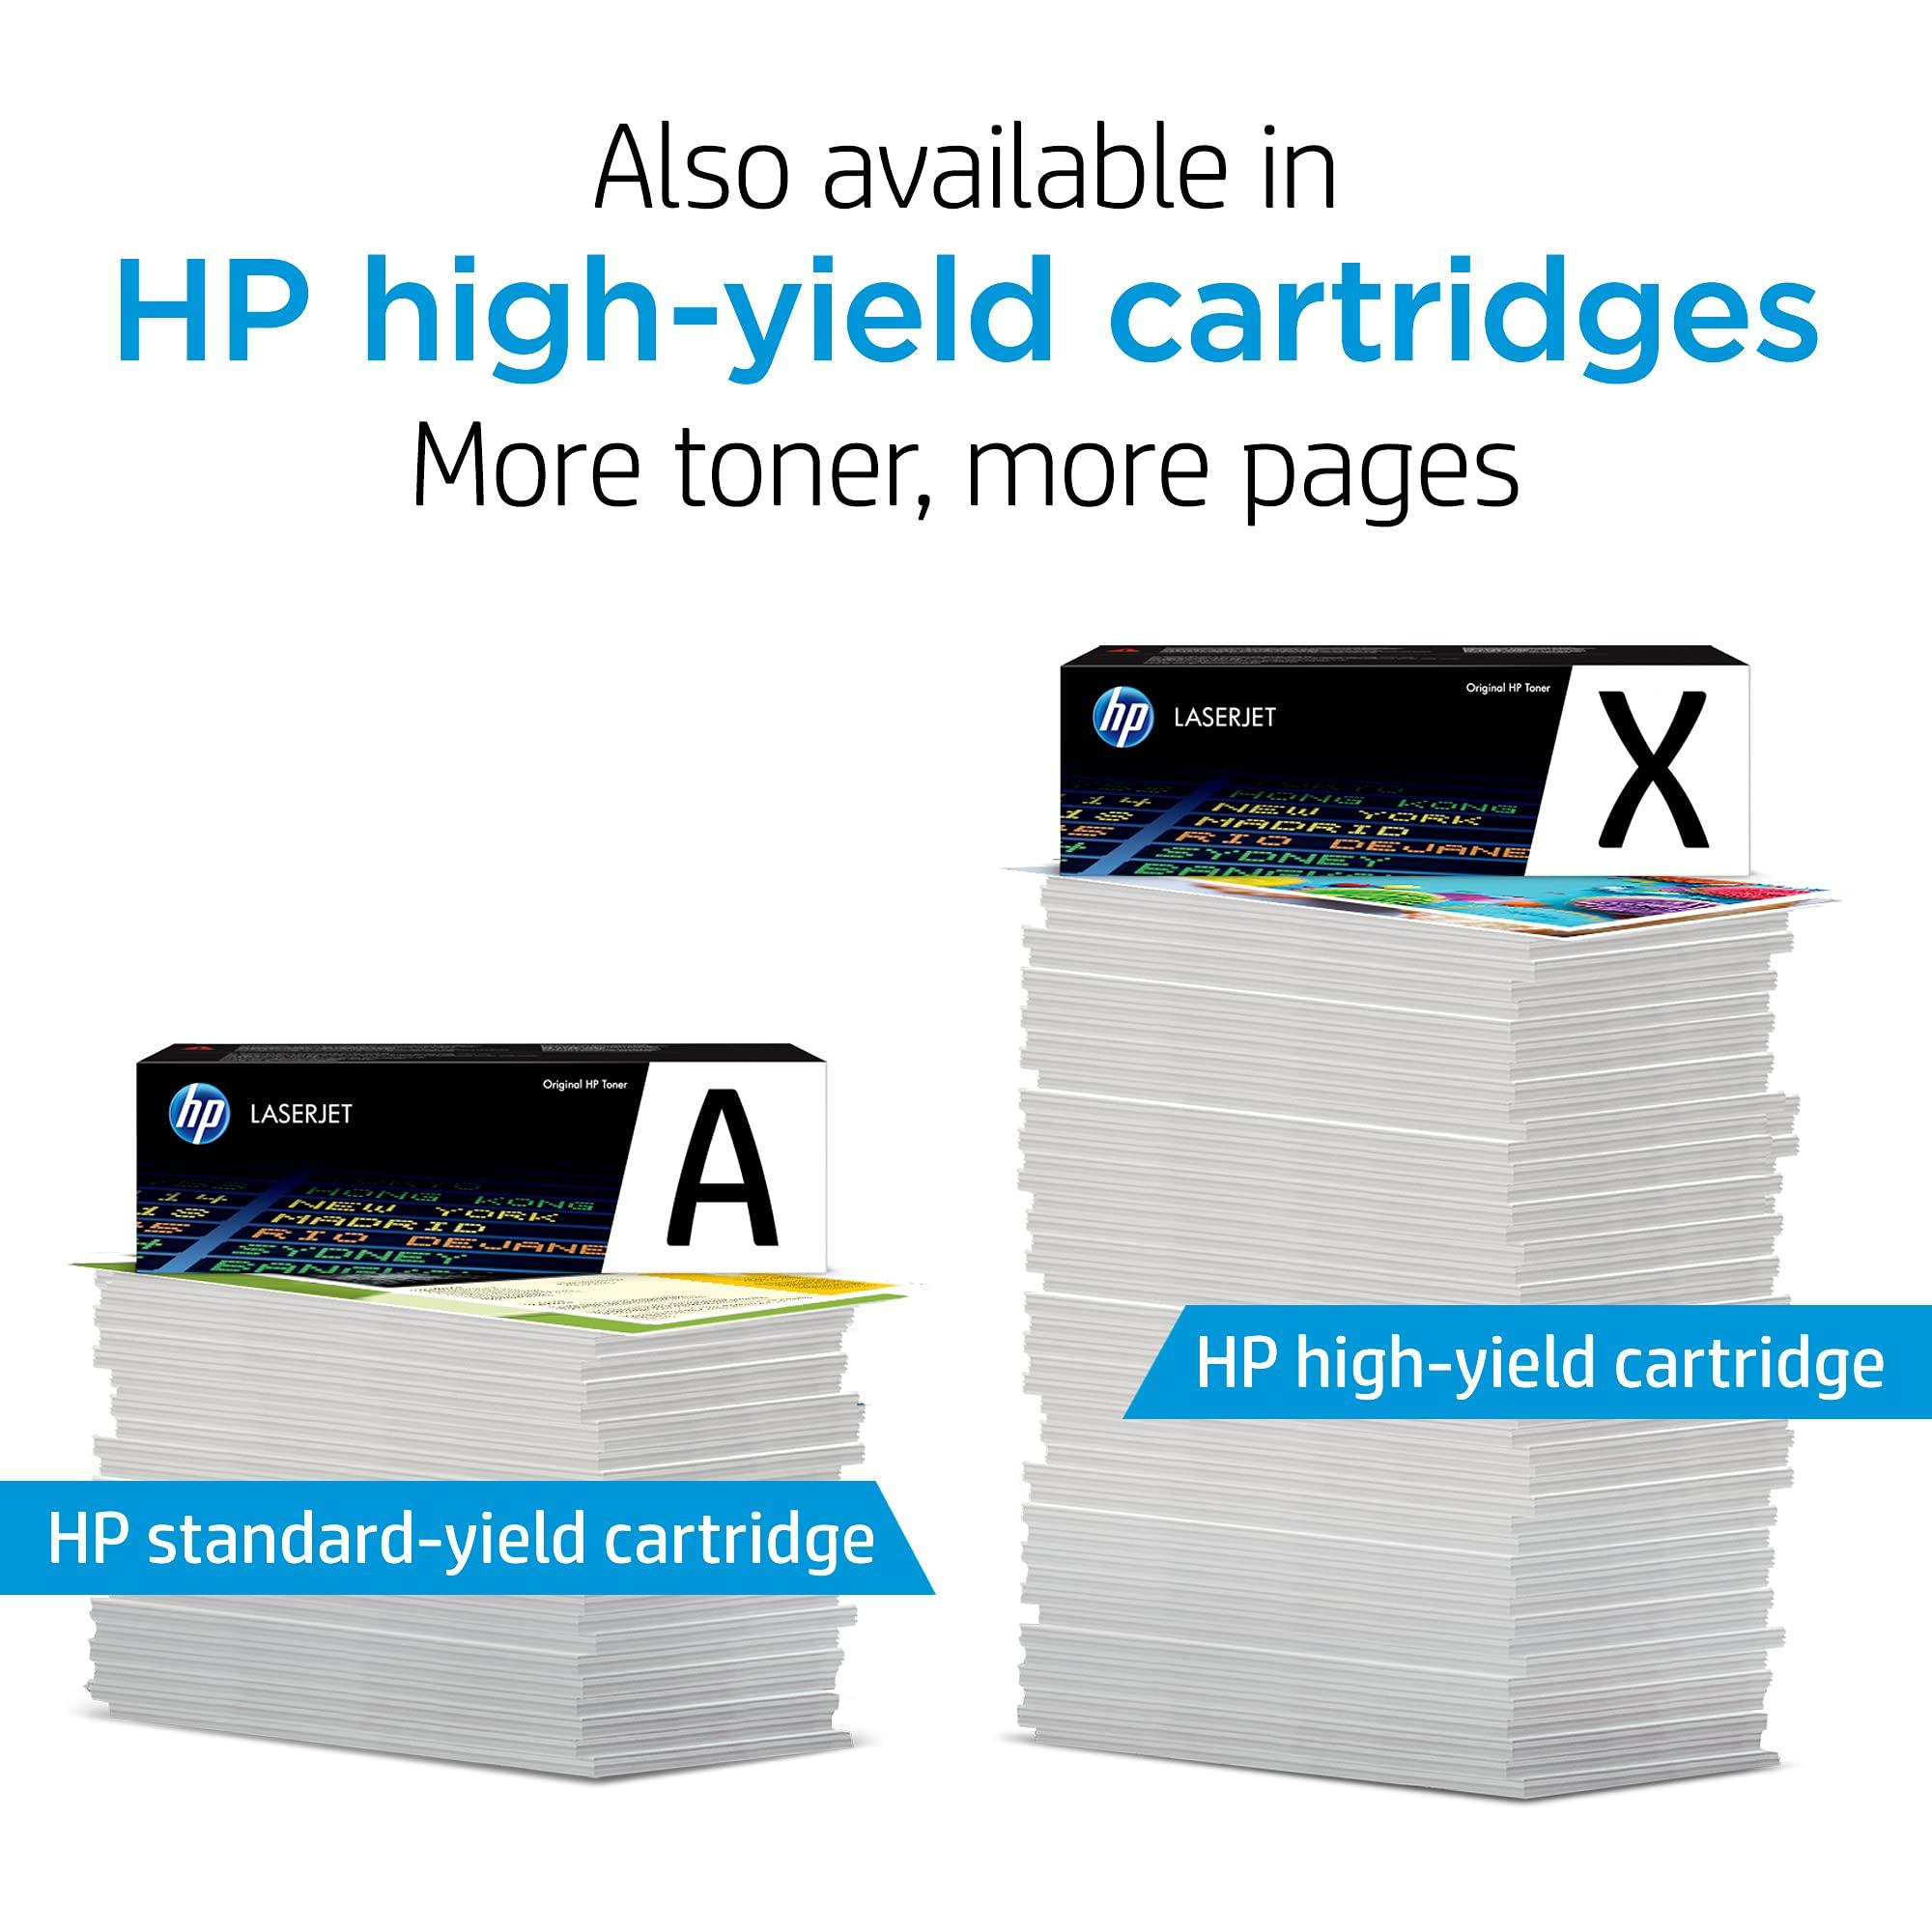 HP 202X   CF500XD   2 Toner-Cartridges   Black   Works with HP LaserJet Pro M254, M281cdw, M281dw, M281fdw   High Yield